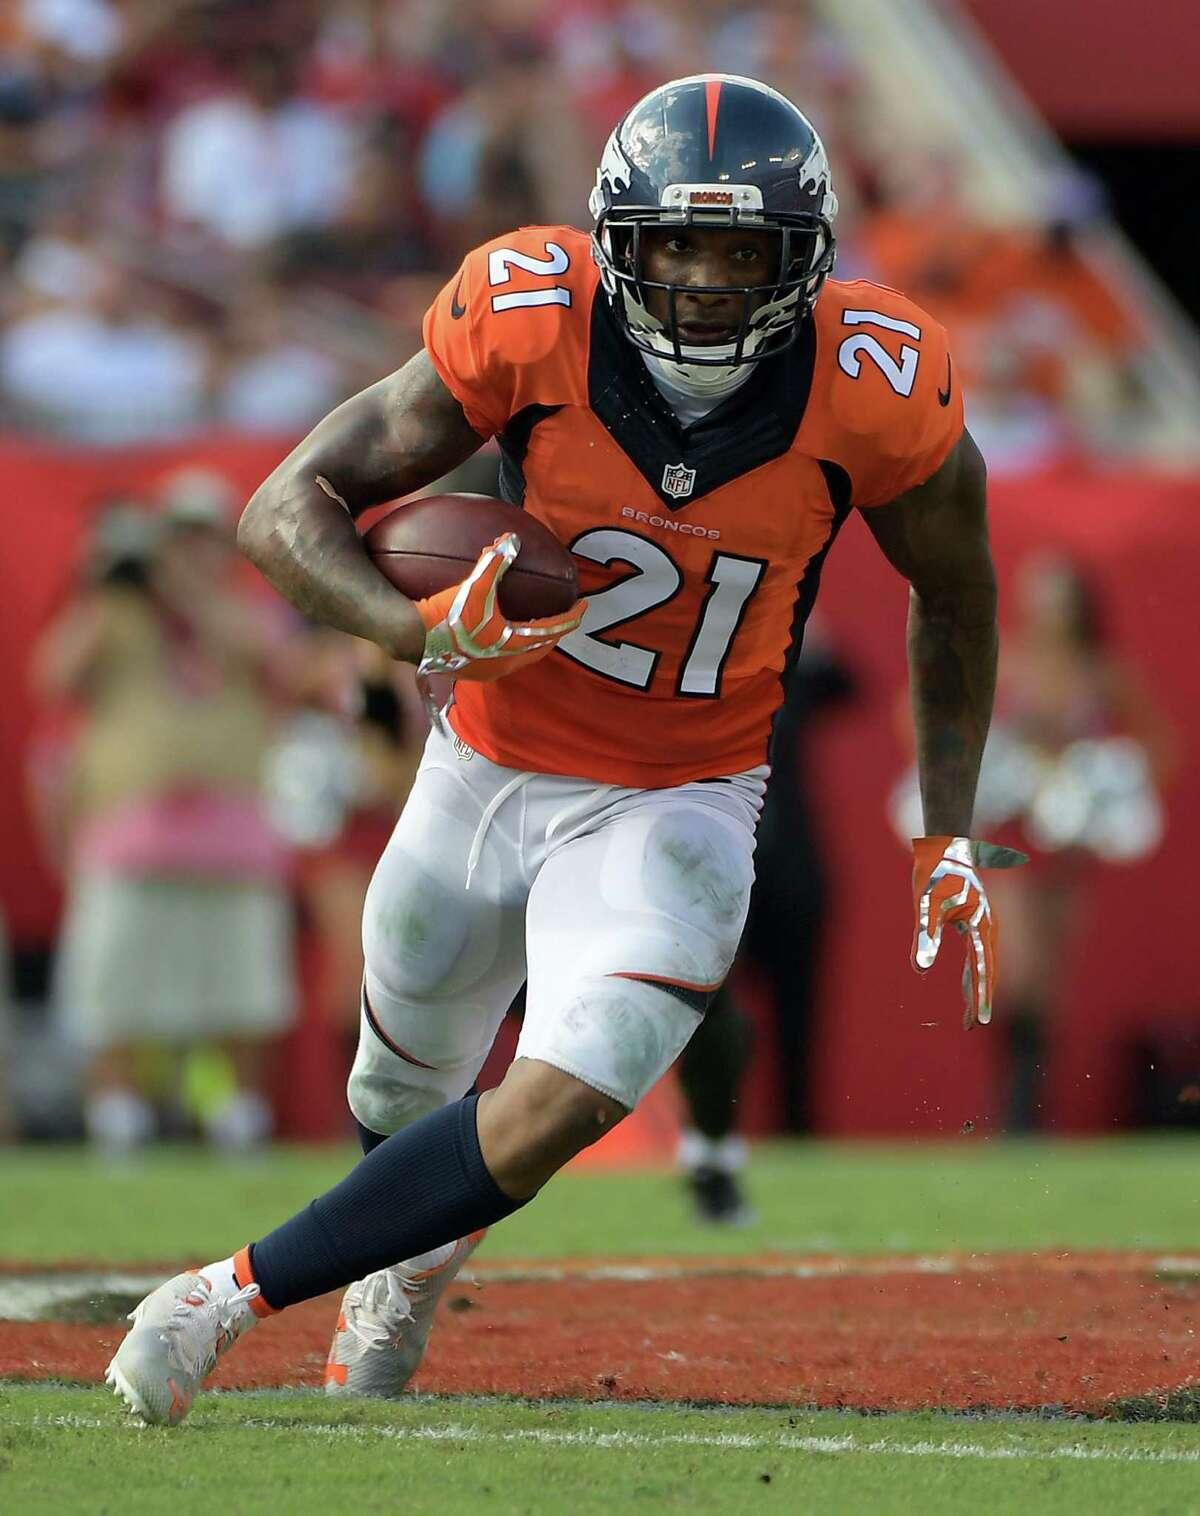 Houston (4-2) plus-7 at Denver (4-2) Broncos 23-13